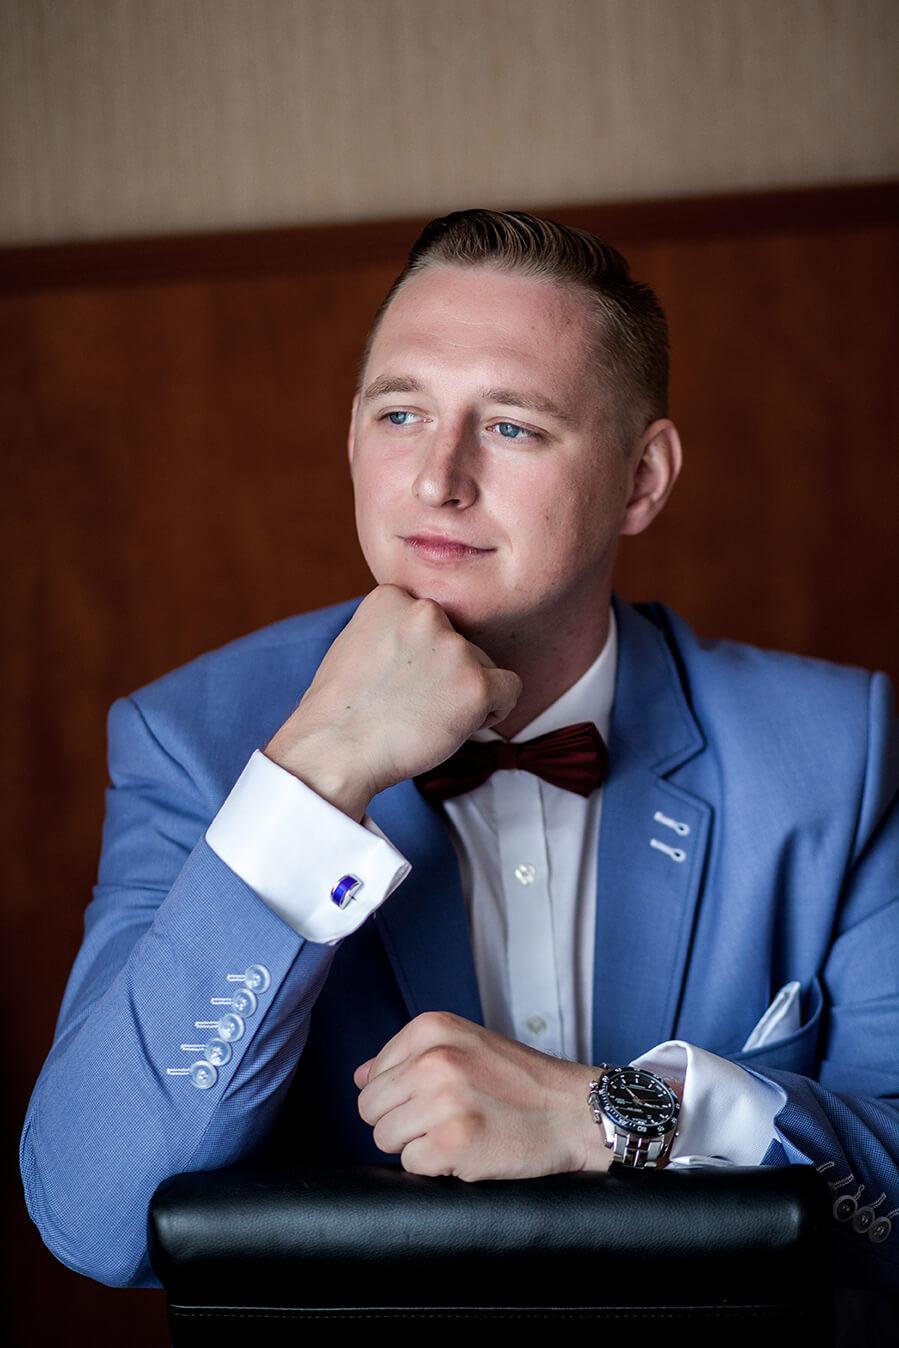 1-svadebnyj-fotograf-videooperator-svadebnoe-foto-utro-zheniha-idei-kiev-5